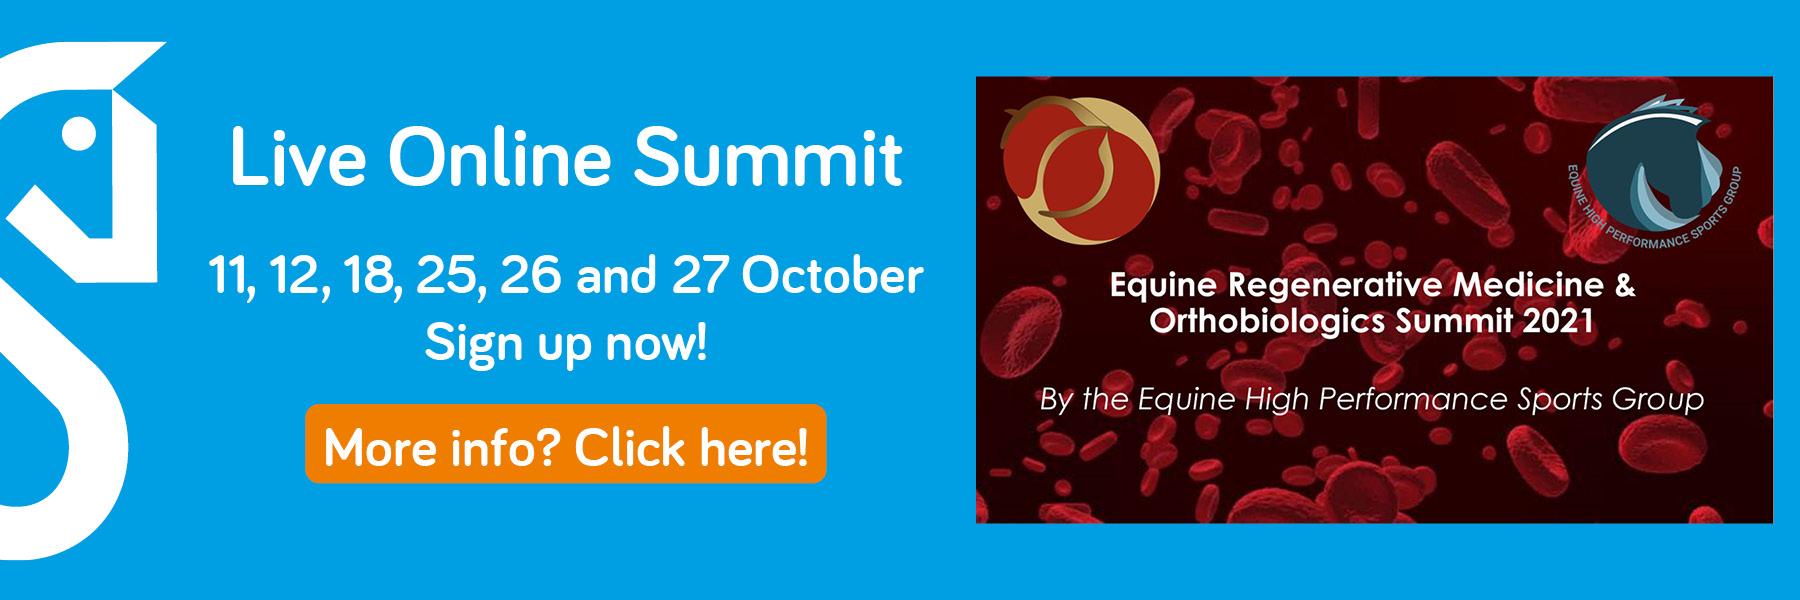 Equine regenerative medicine and orthobiologics summit for horses 2021